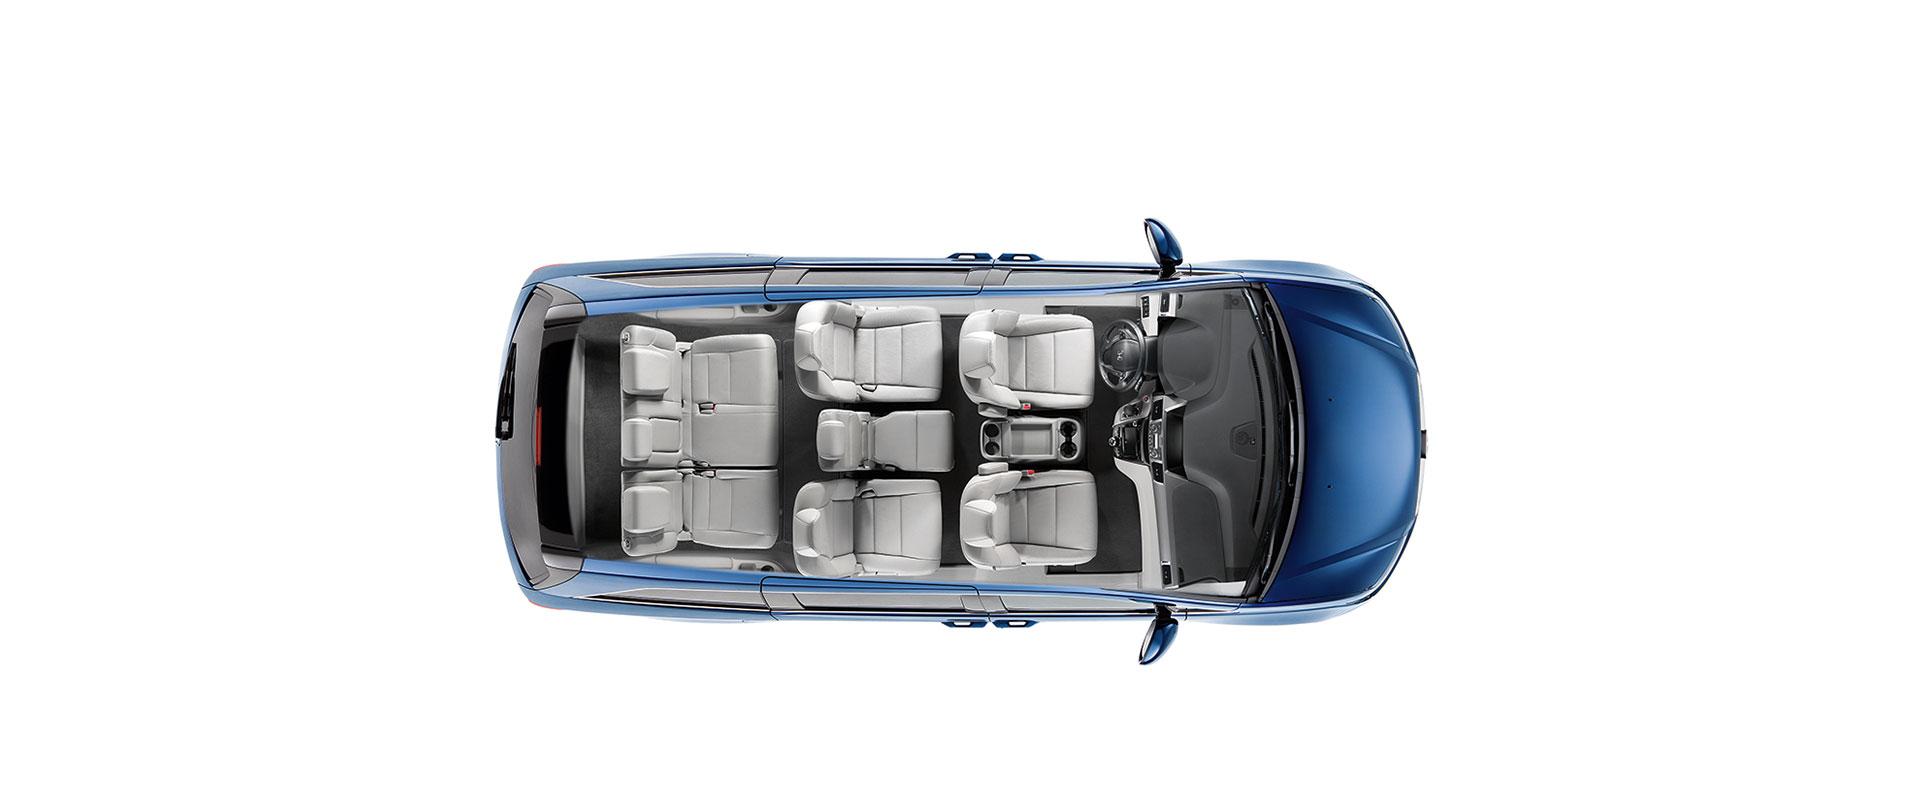 2017 Honda Odyssey Wide-Mode 2nd-Row Seats